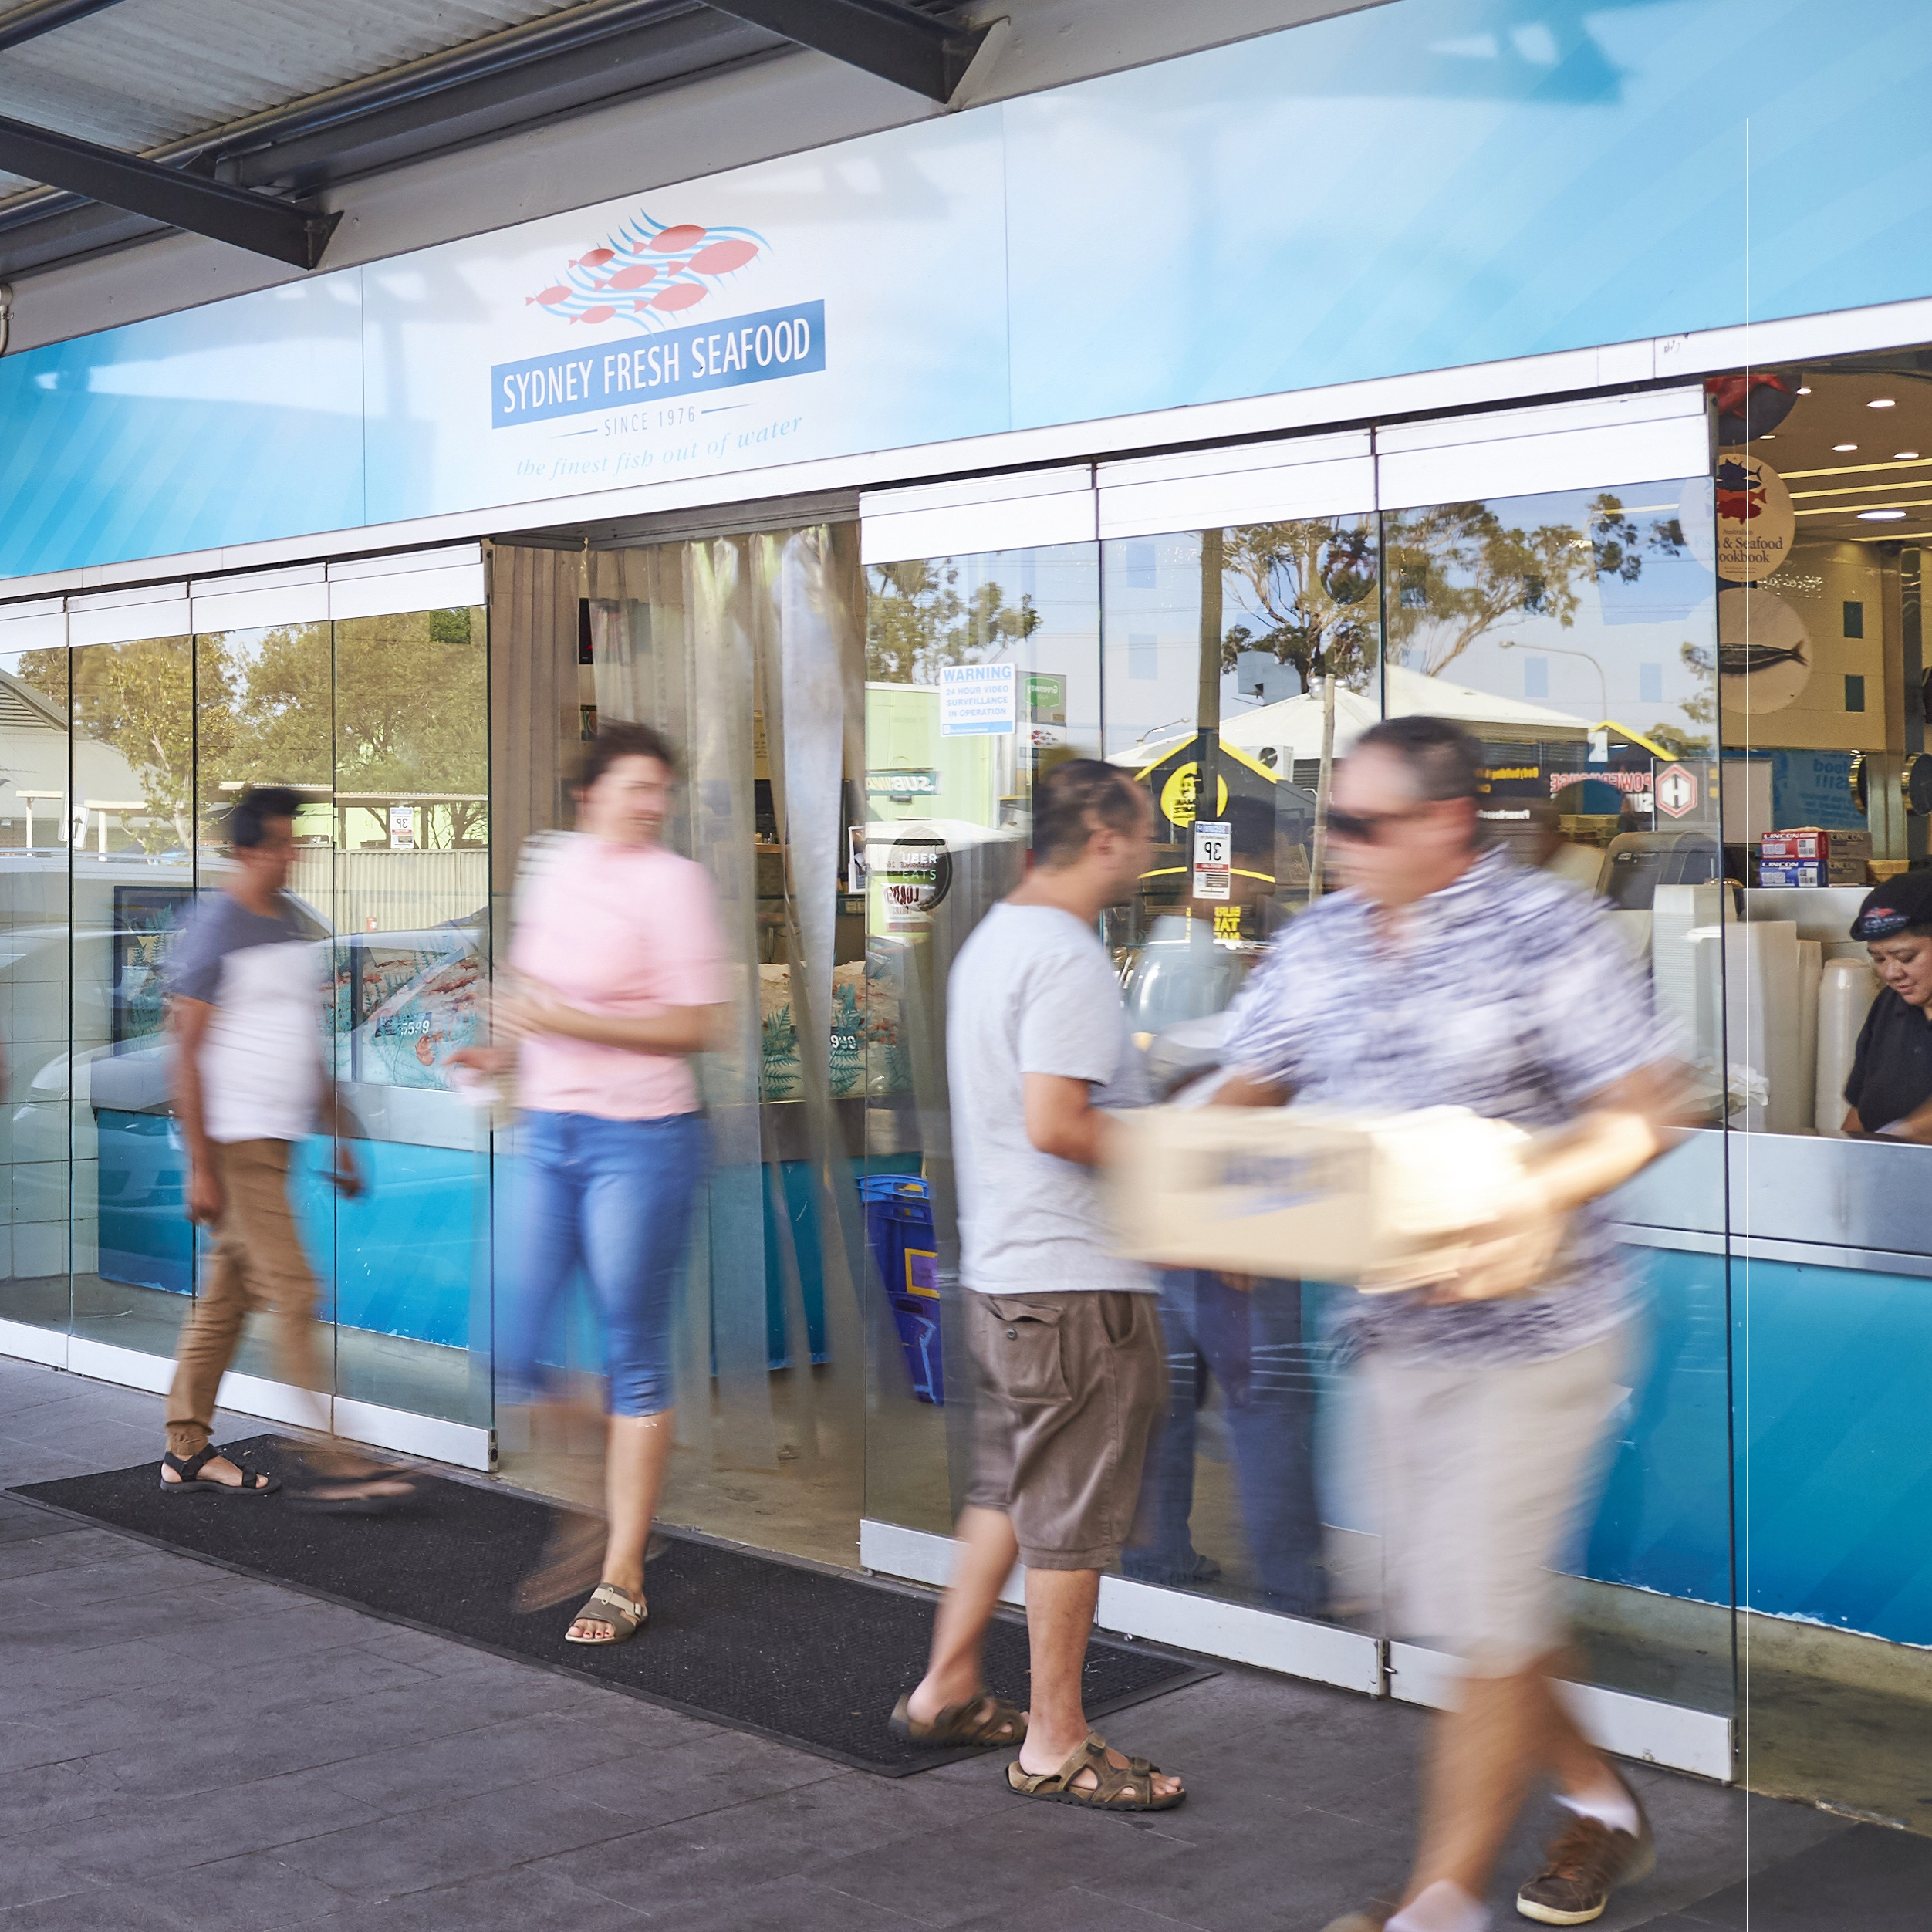 Sydney Fresh Seafood store